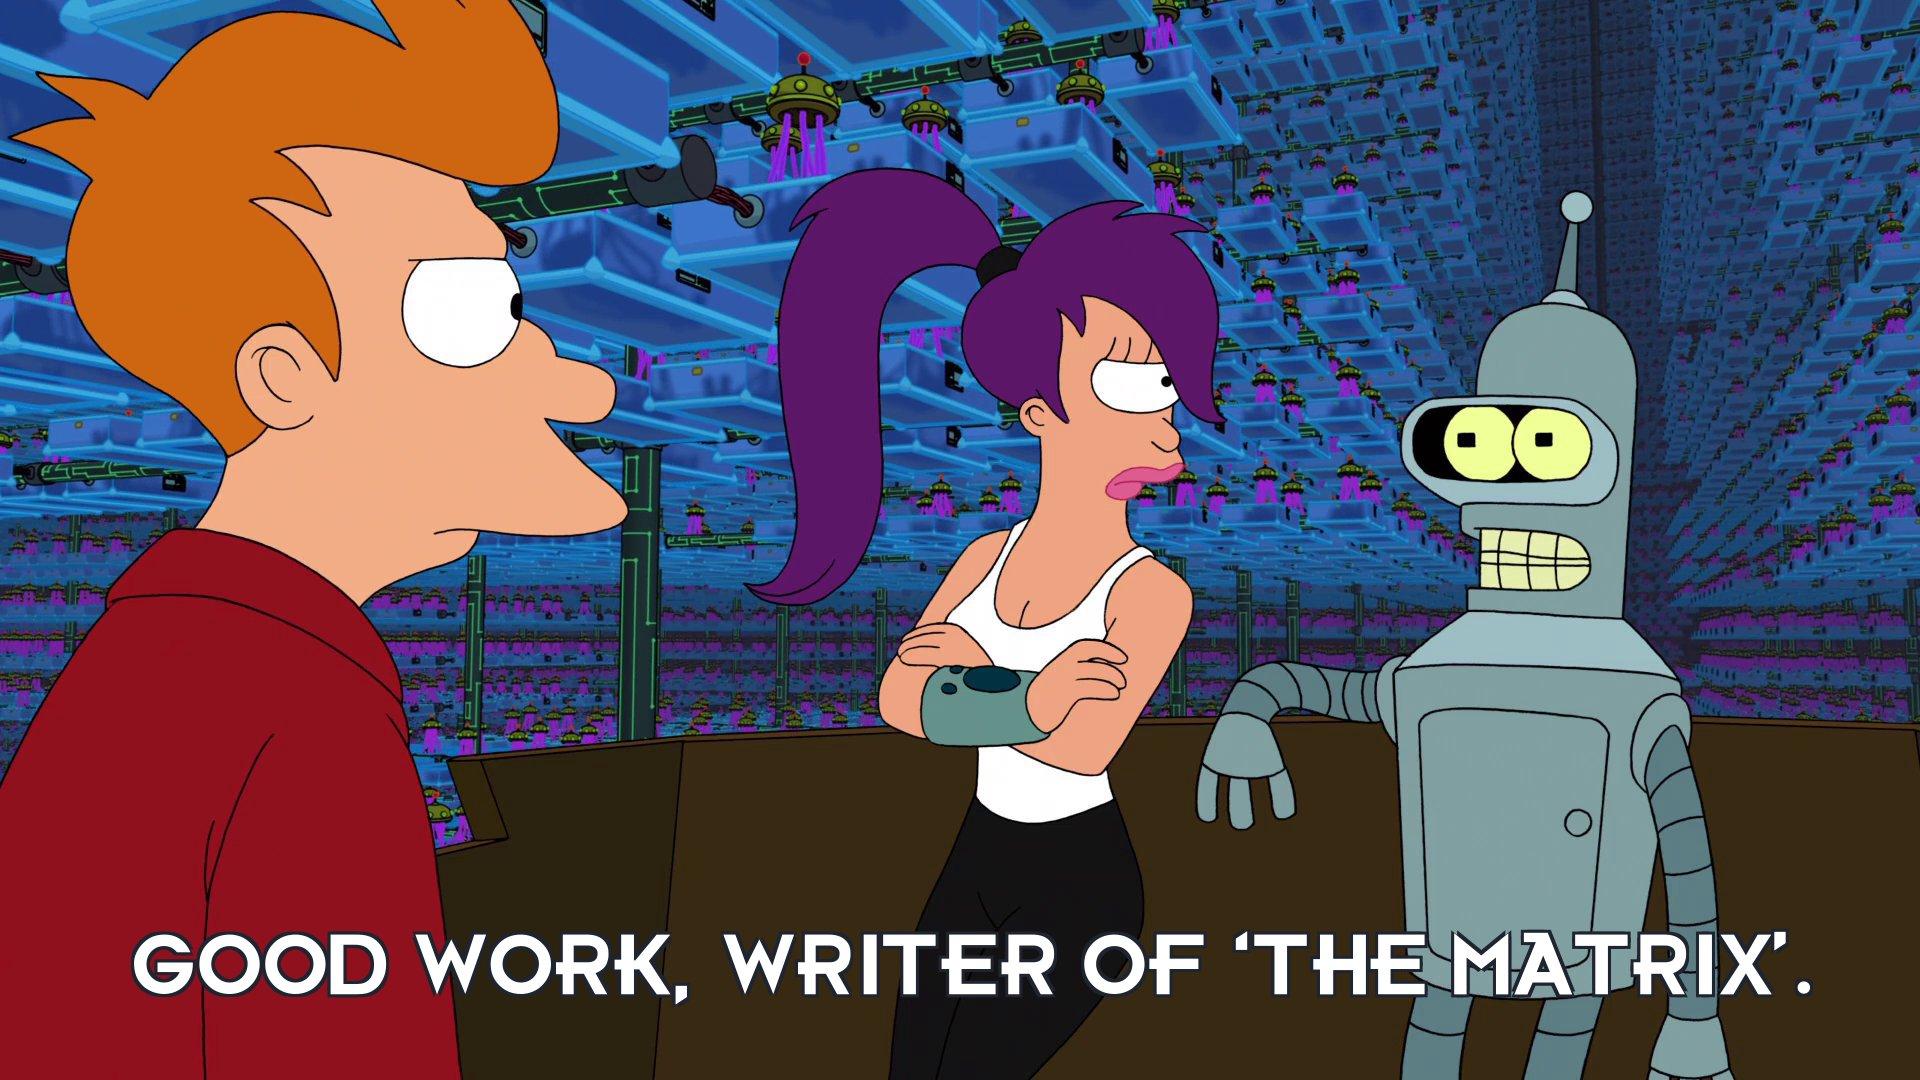 Bender Bending Rodriguez: Good work, writer of 'The Matrix'.